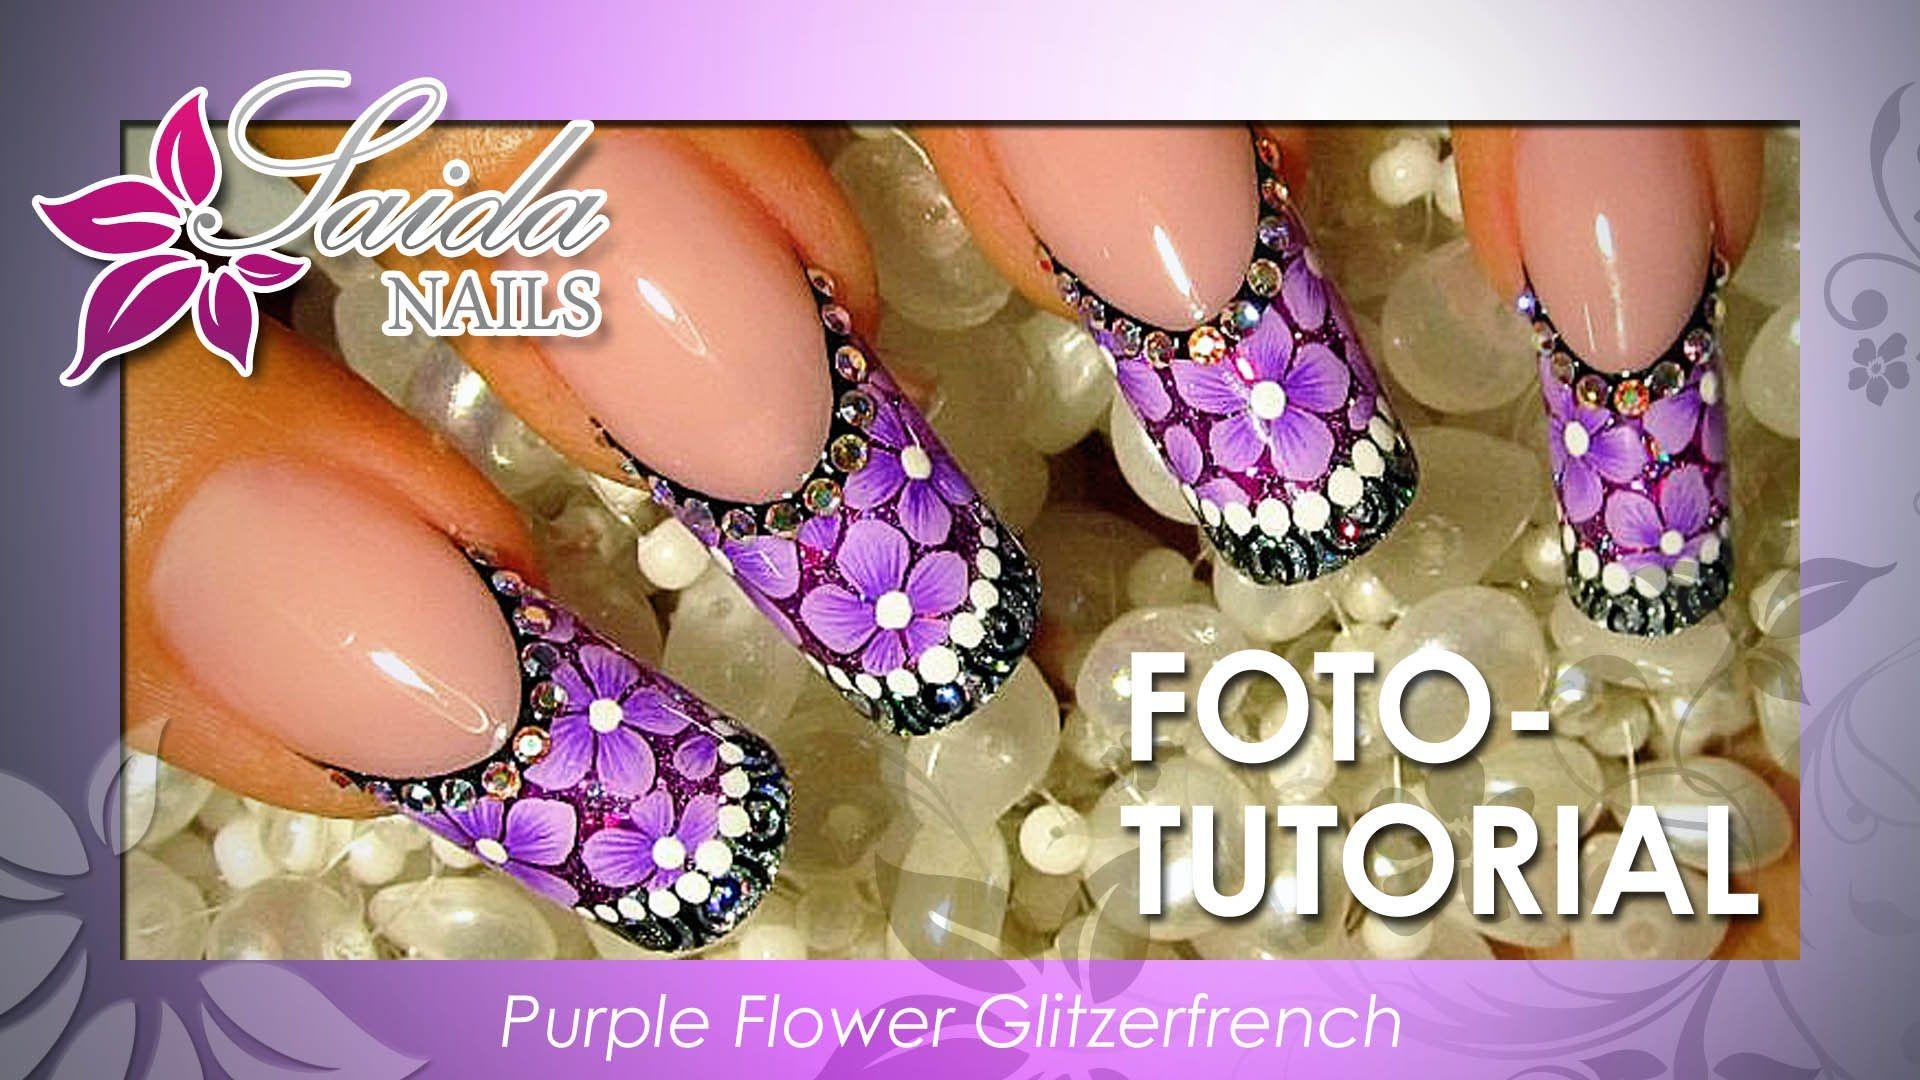 Nailart Foto Tutorial Purple Flower Glitzerfrench By Saida Nails